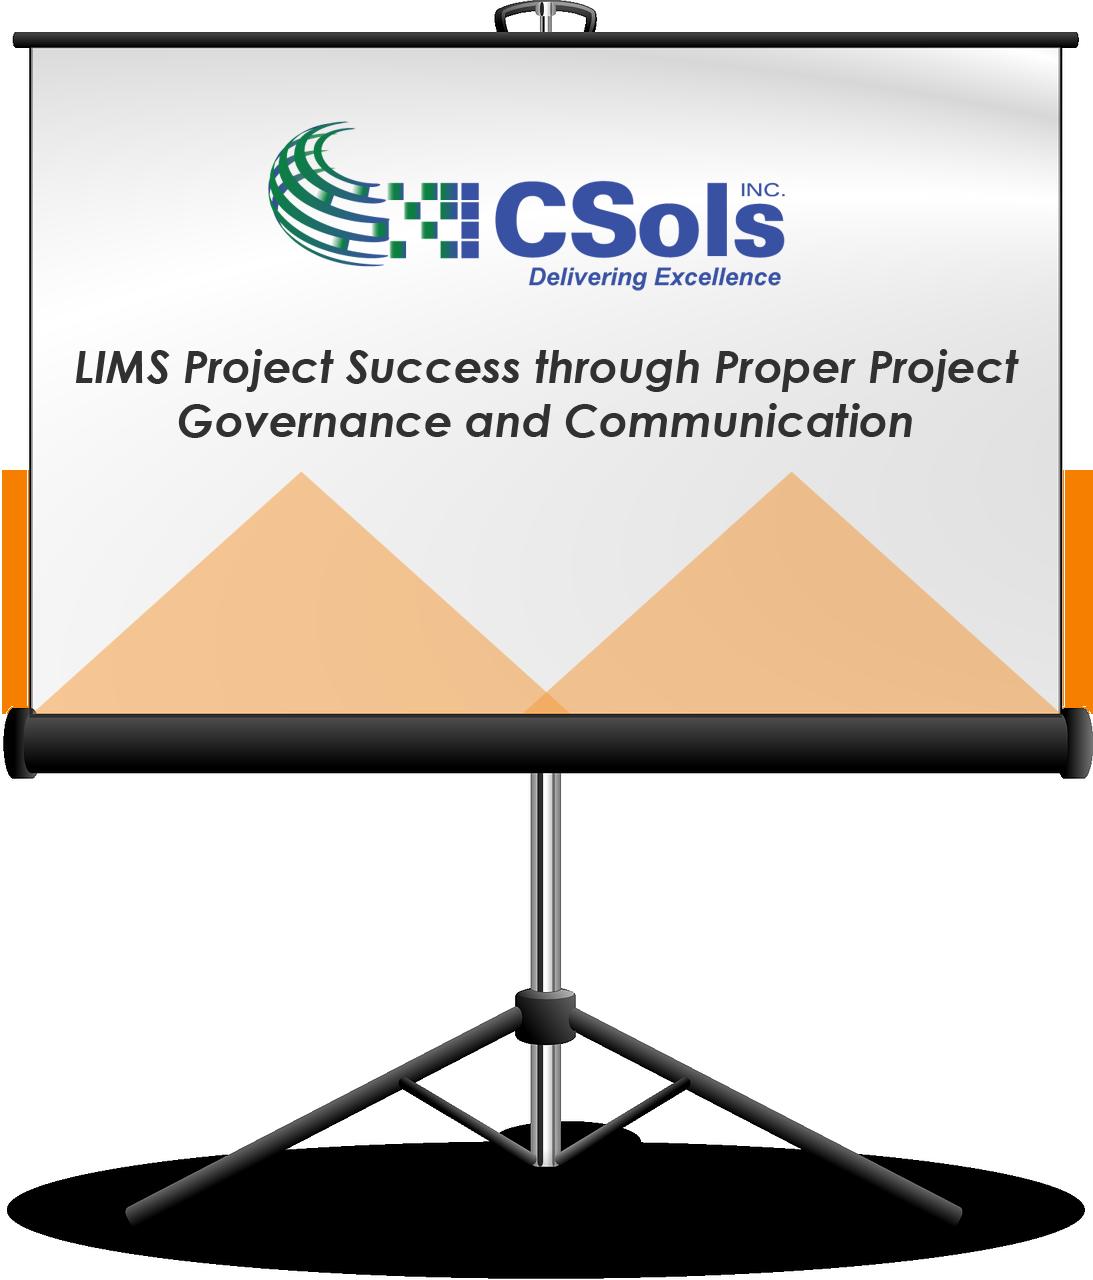 LIMS Project Success through Proper Project Governance